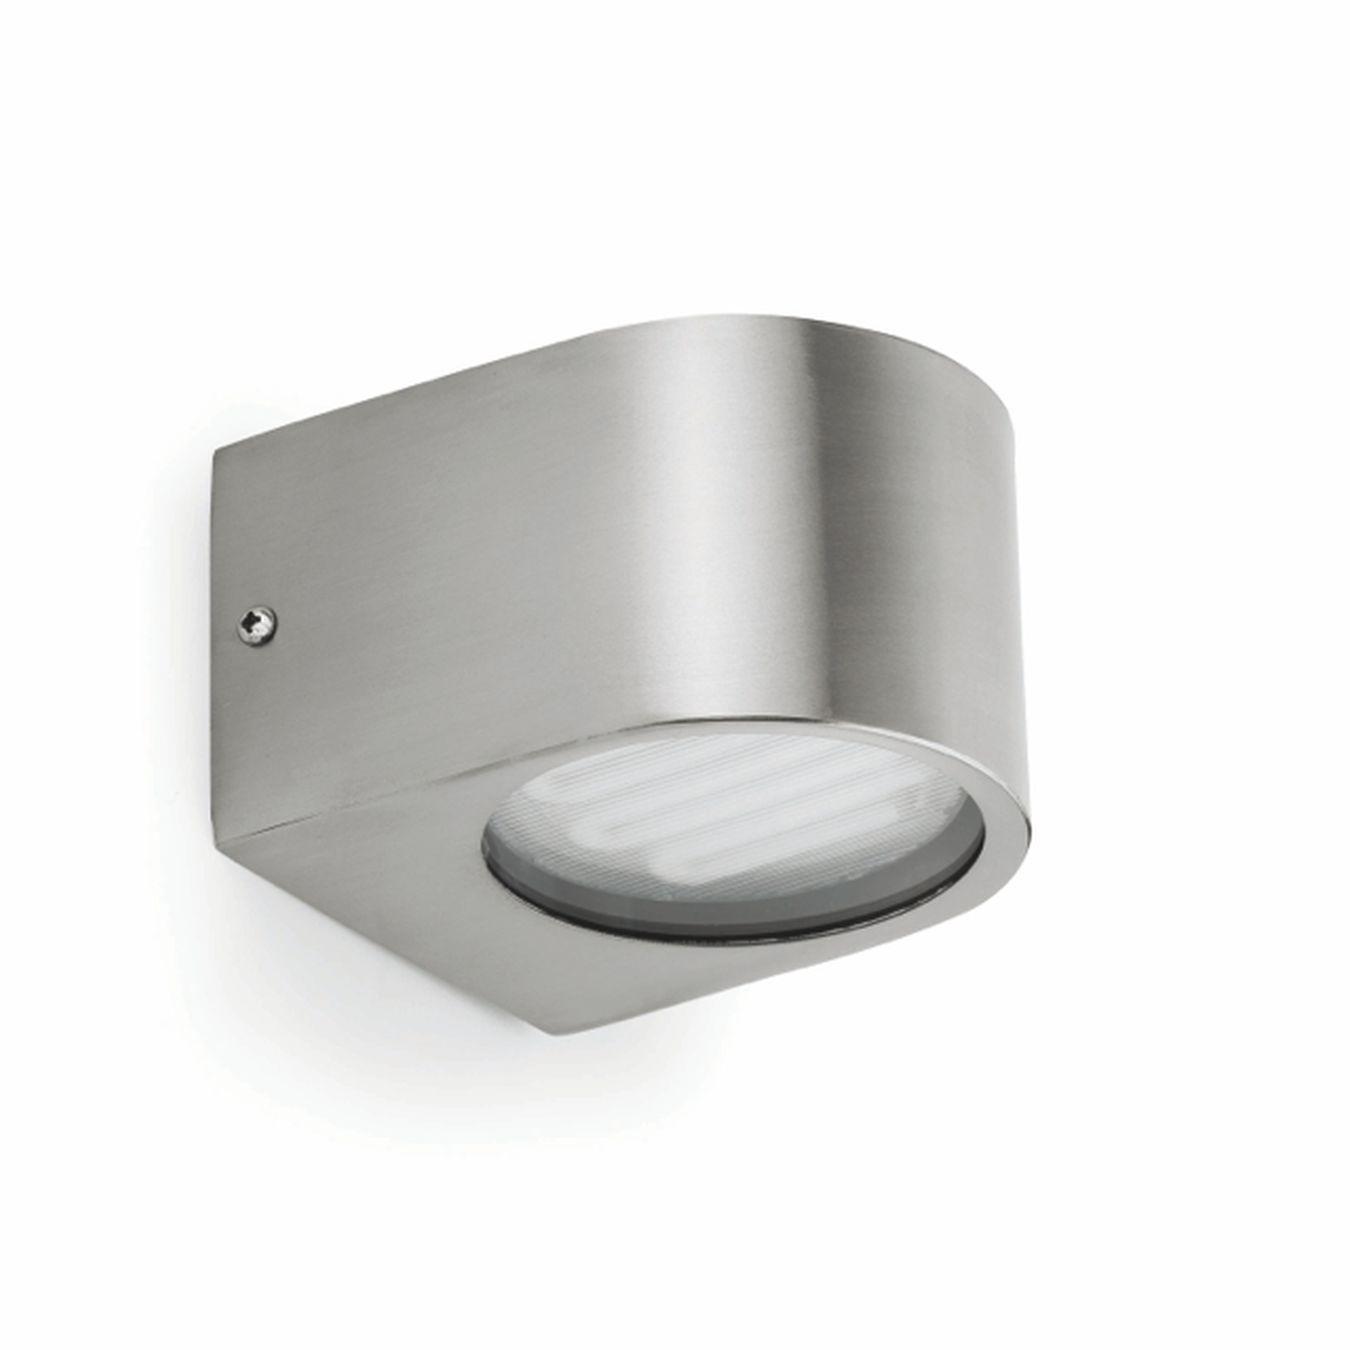 Aplique de bajo consumo para exterior lamparas for Lamparas para iluminacion exterior